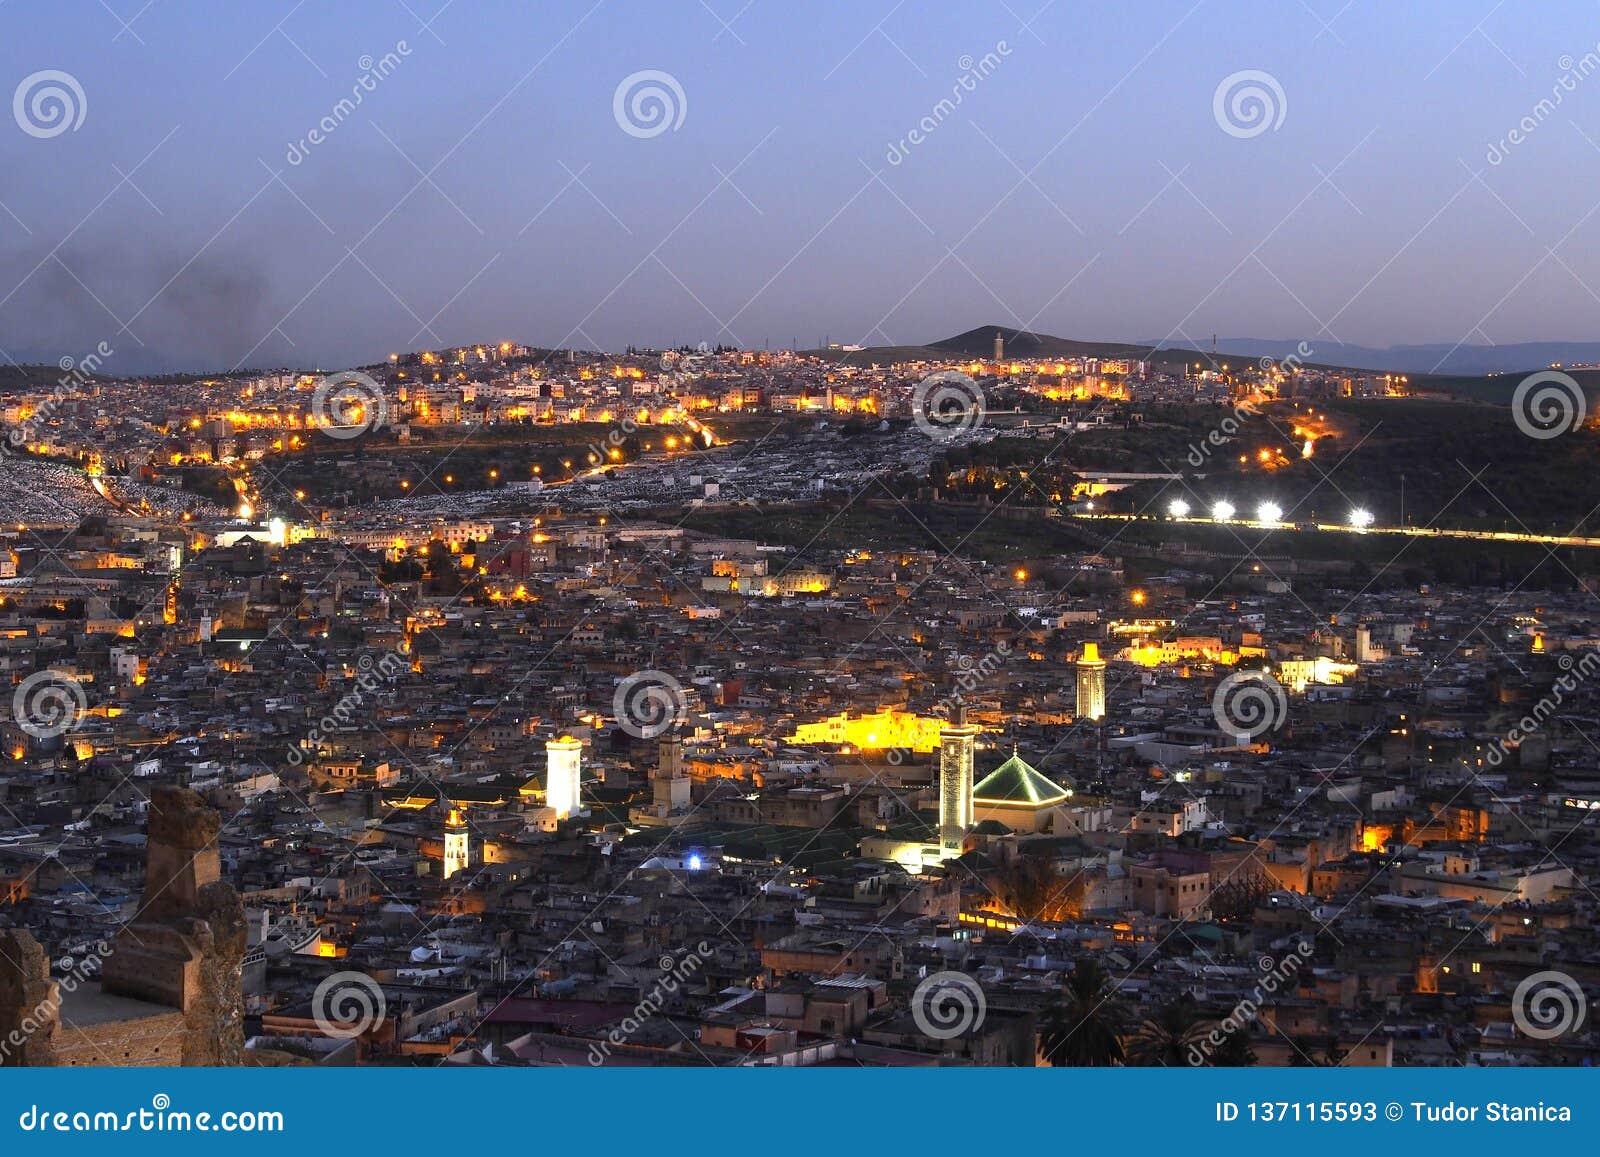 Old City of Fes Marocco nightscene